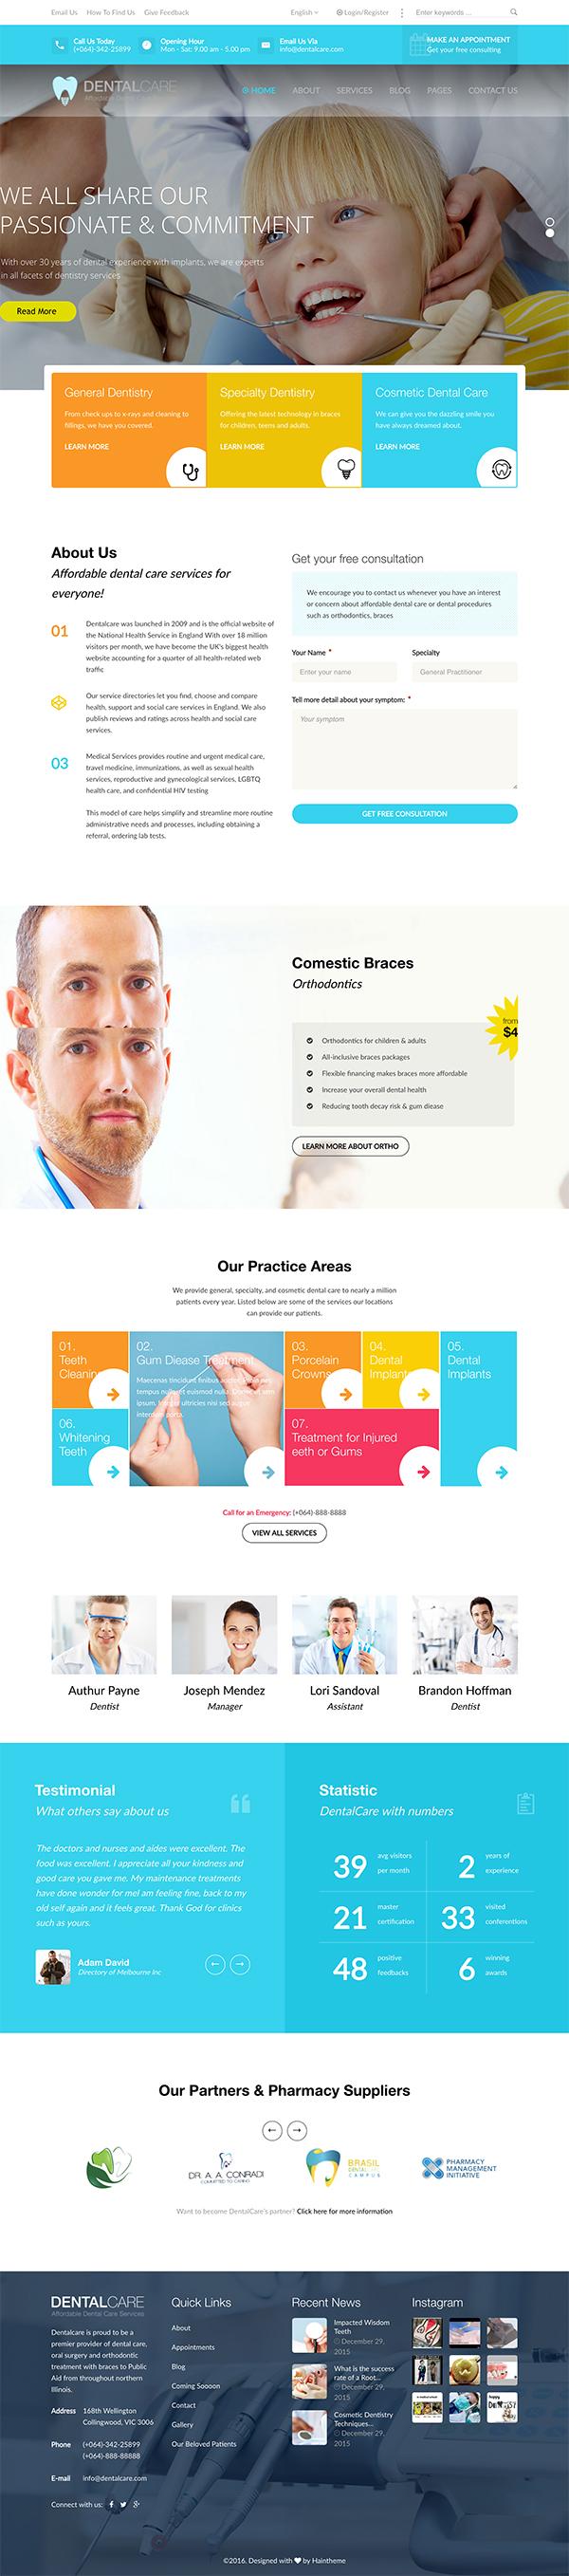 04 Dentalcare - Medical & Health WordPress Theme